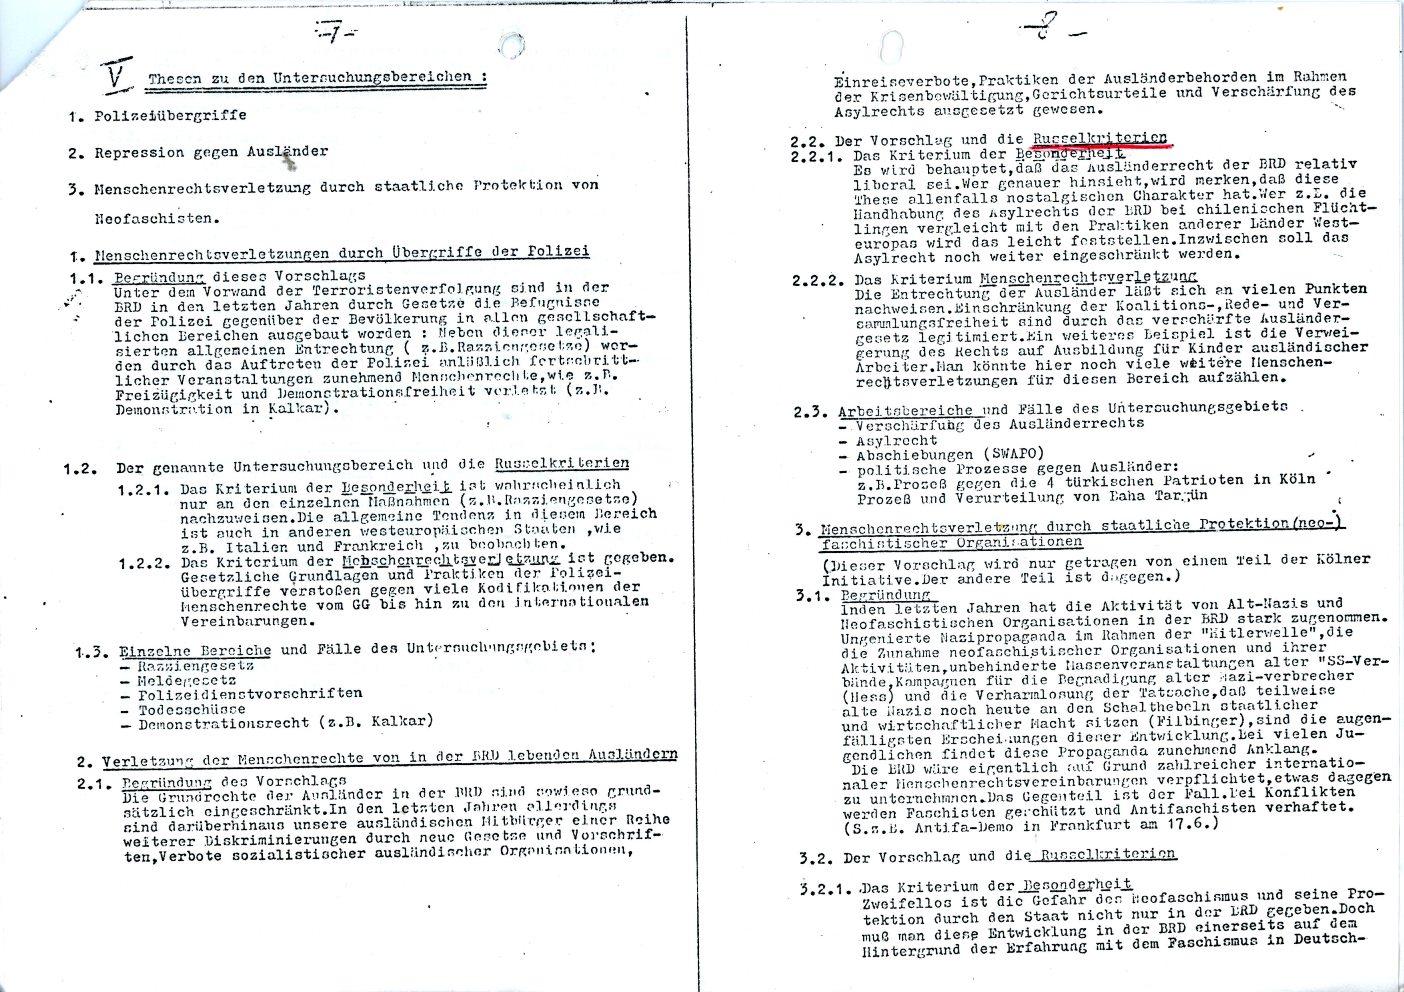 Koeln_Russell_Initiative_Dokumente_1978_07